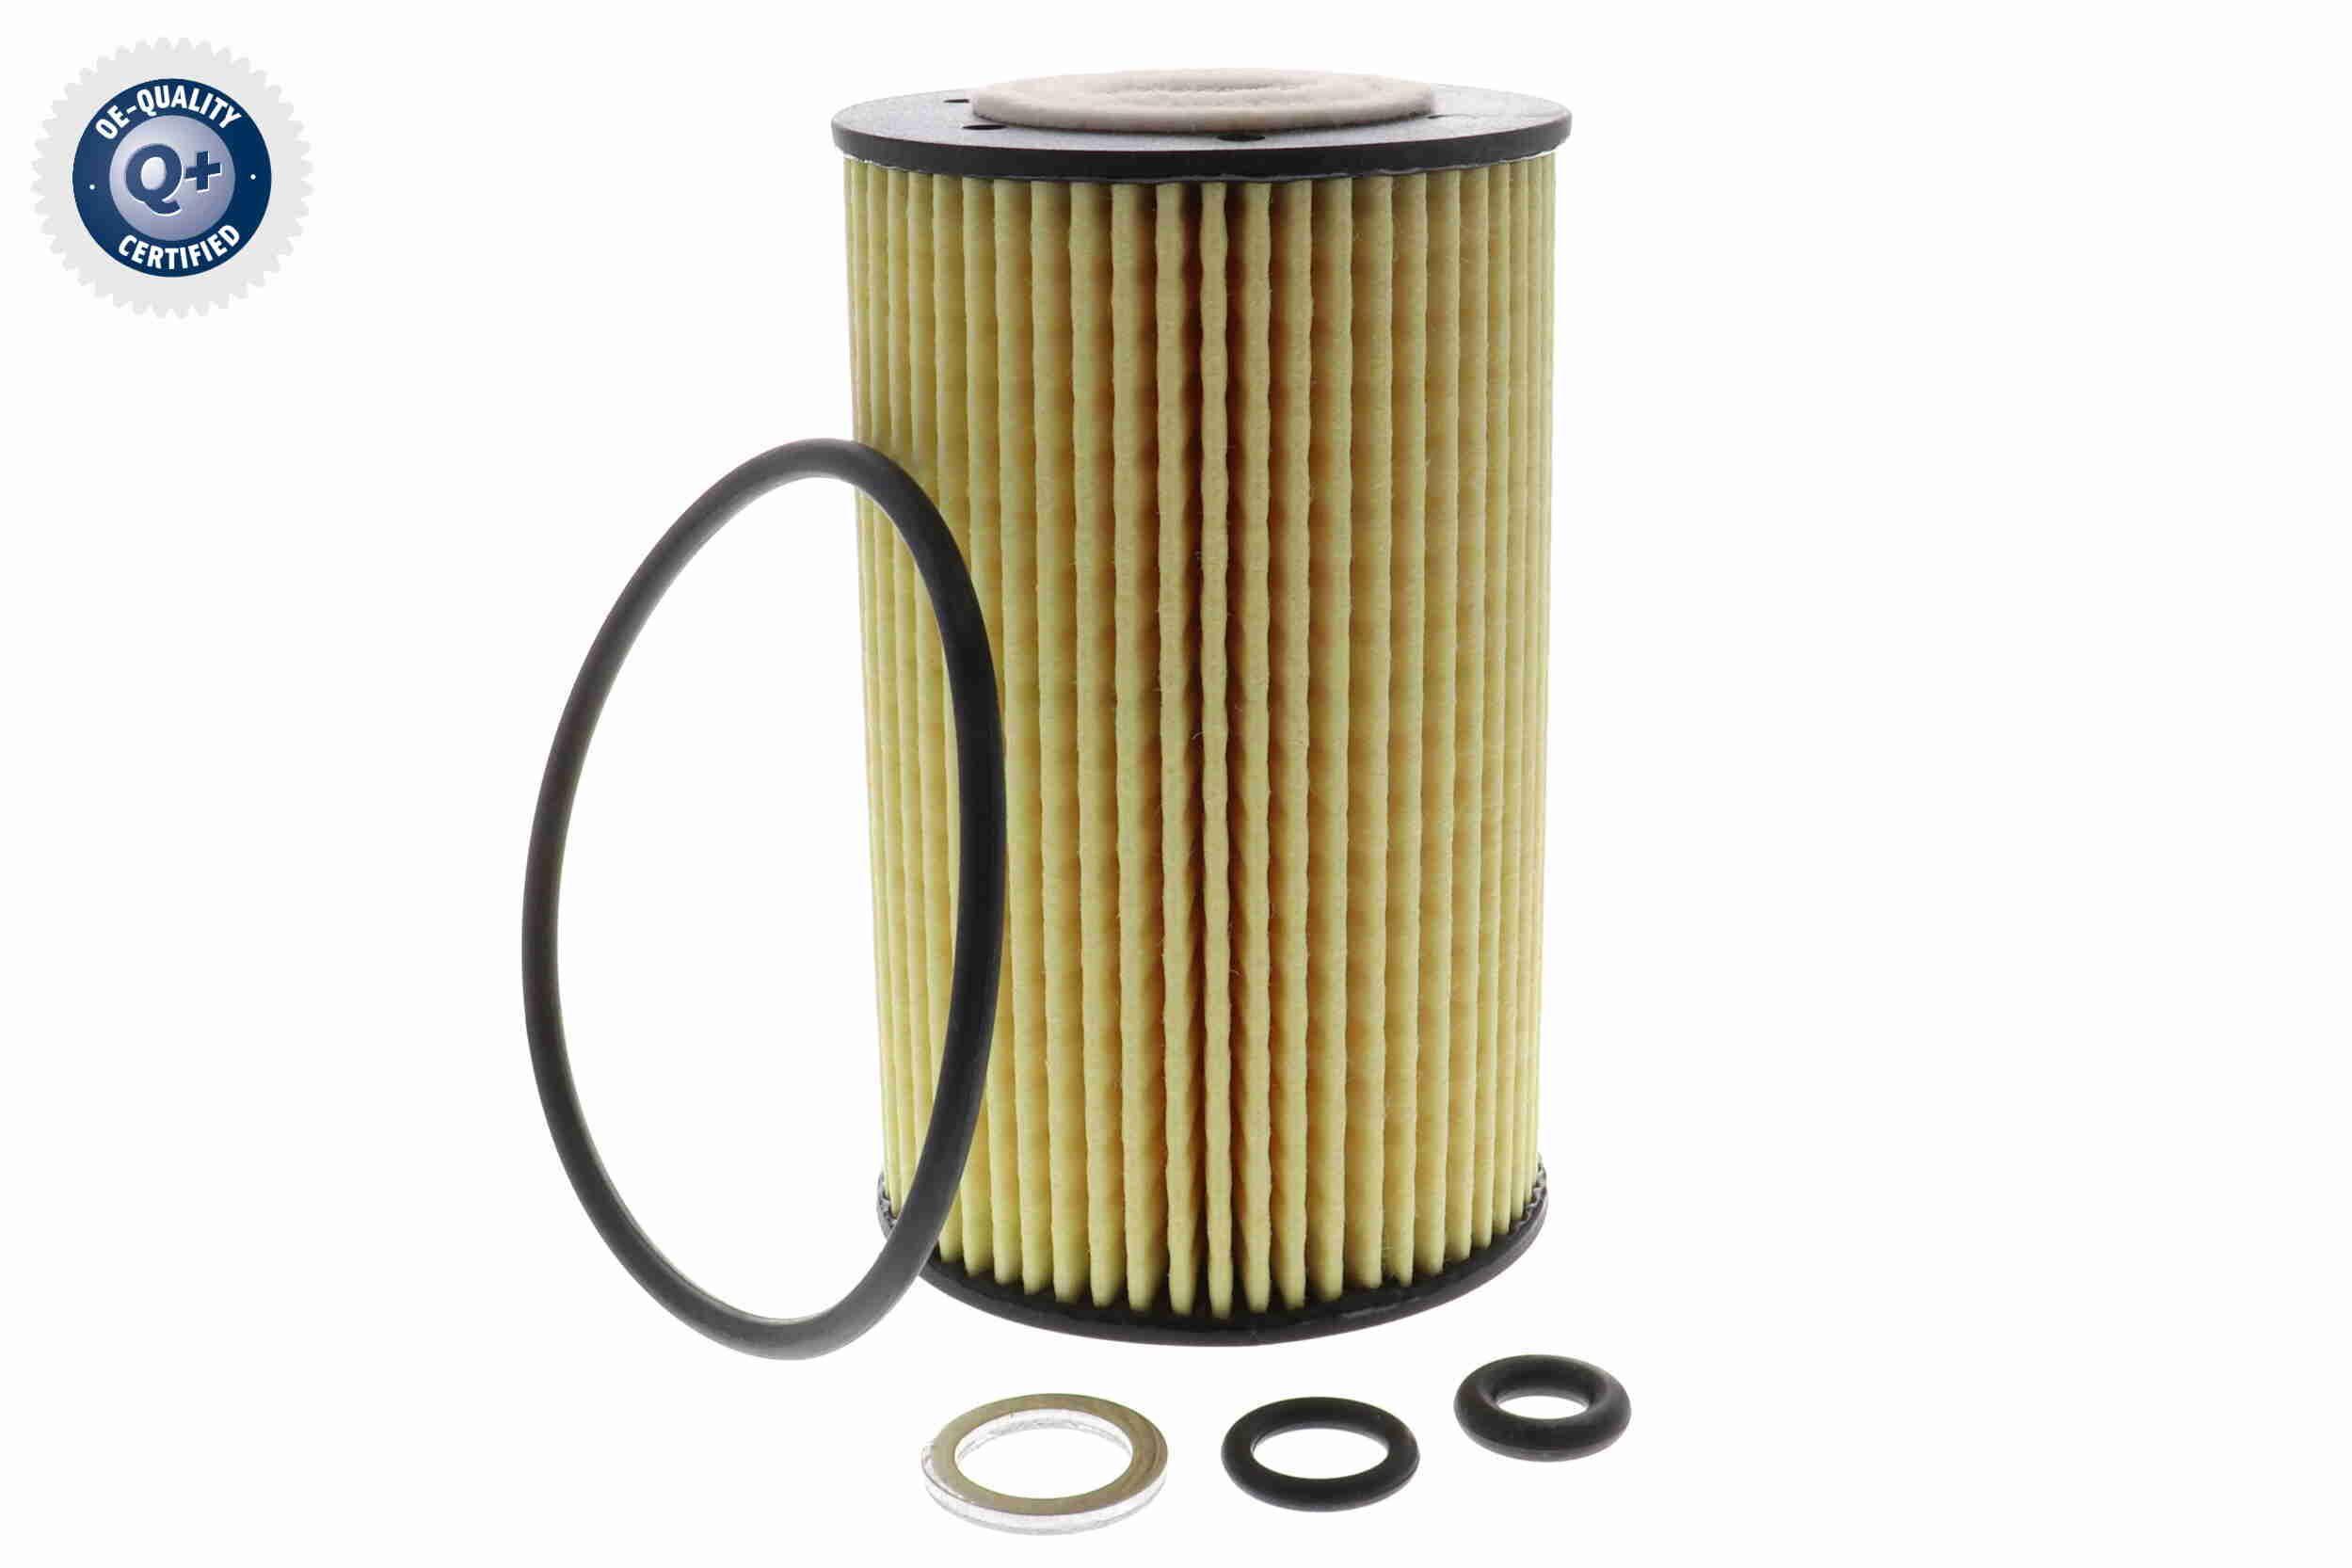 Hyundai ix55 2016 Oil filter ACKOJA A52-0508: Filter Insert